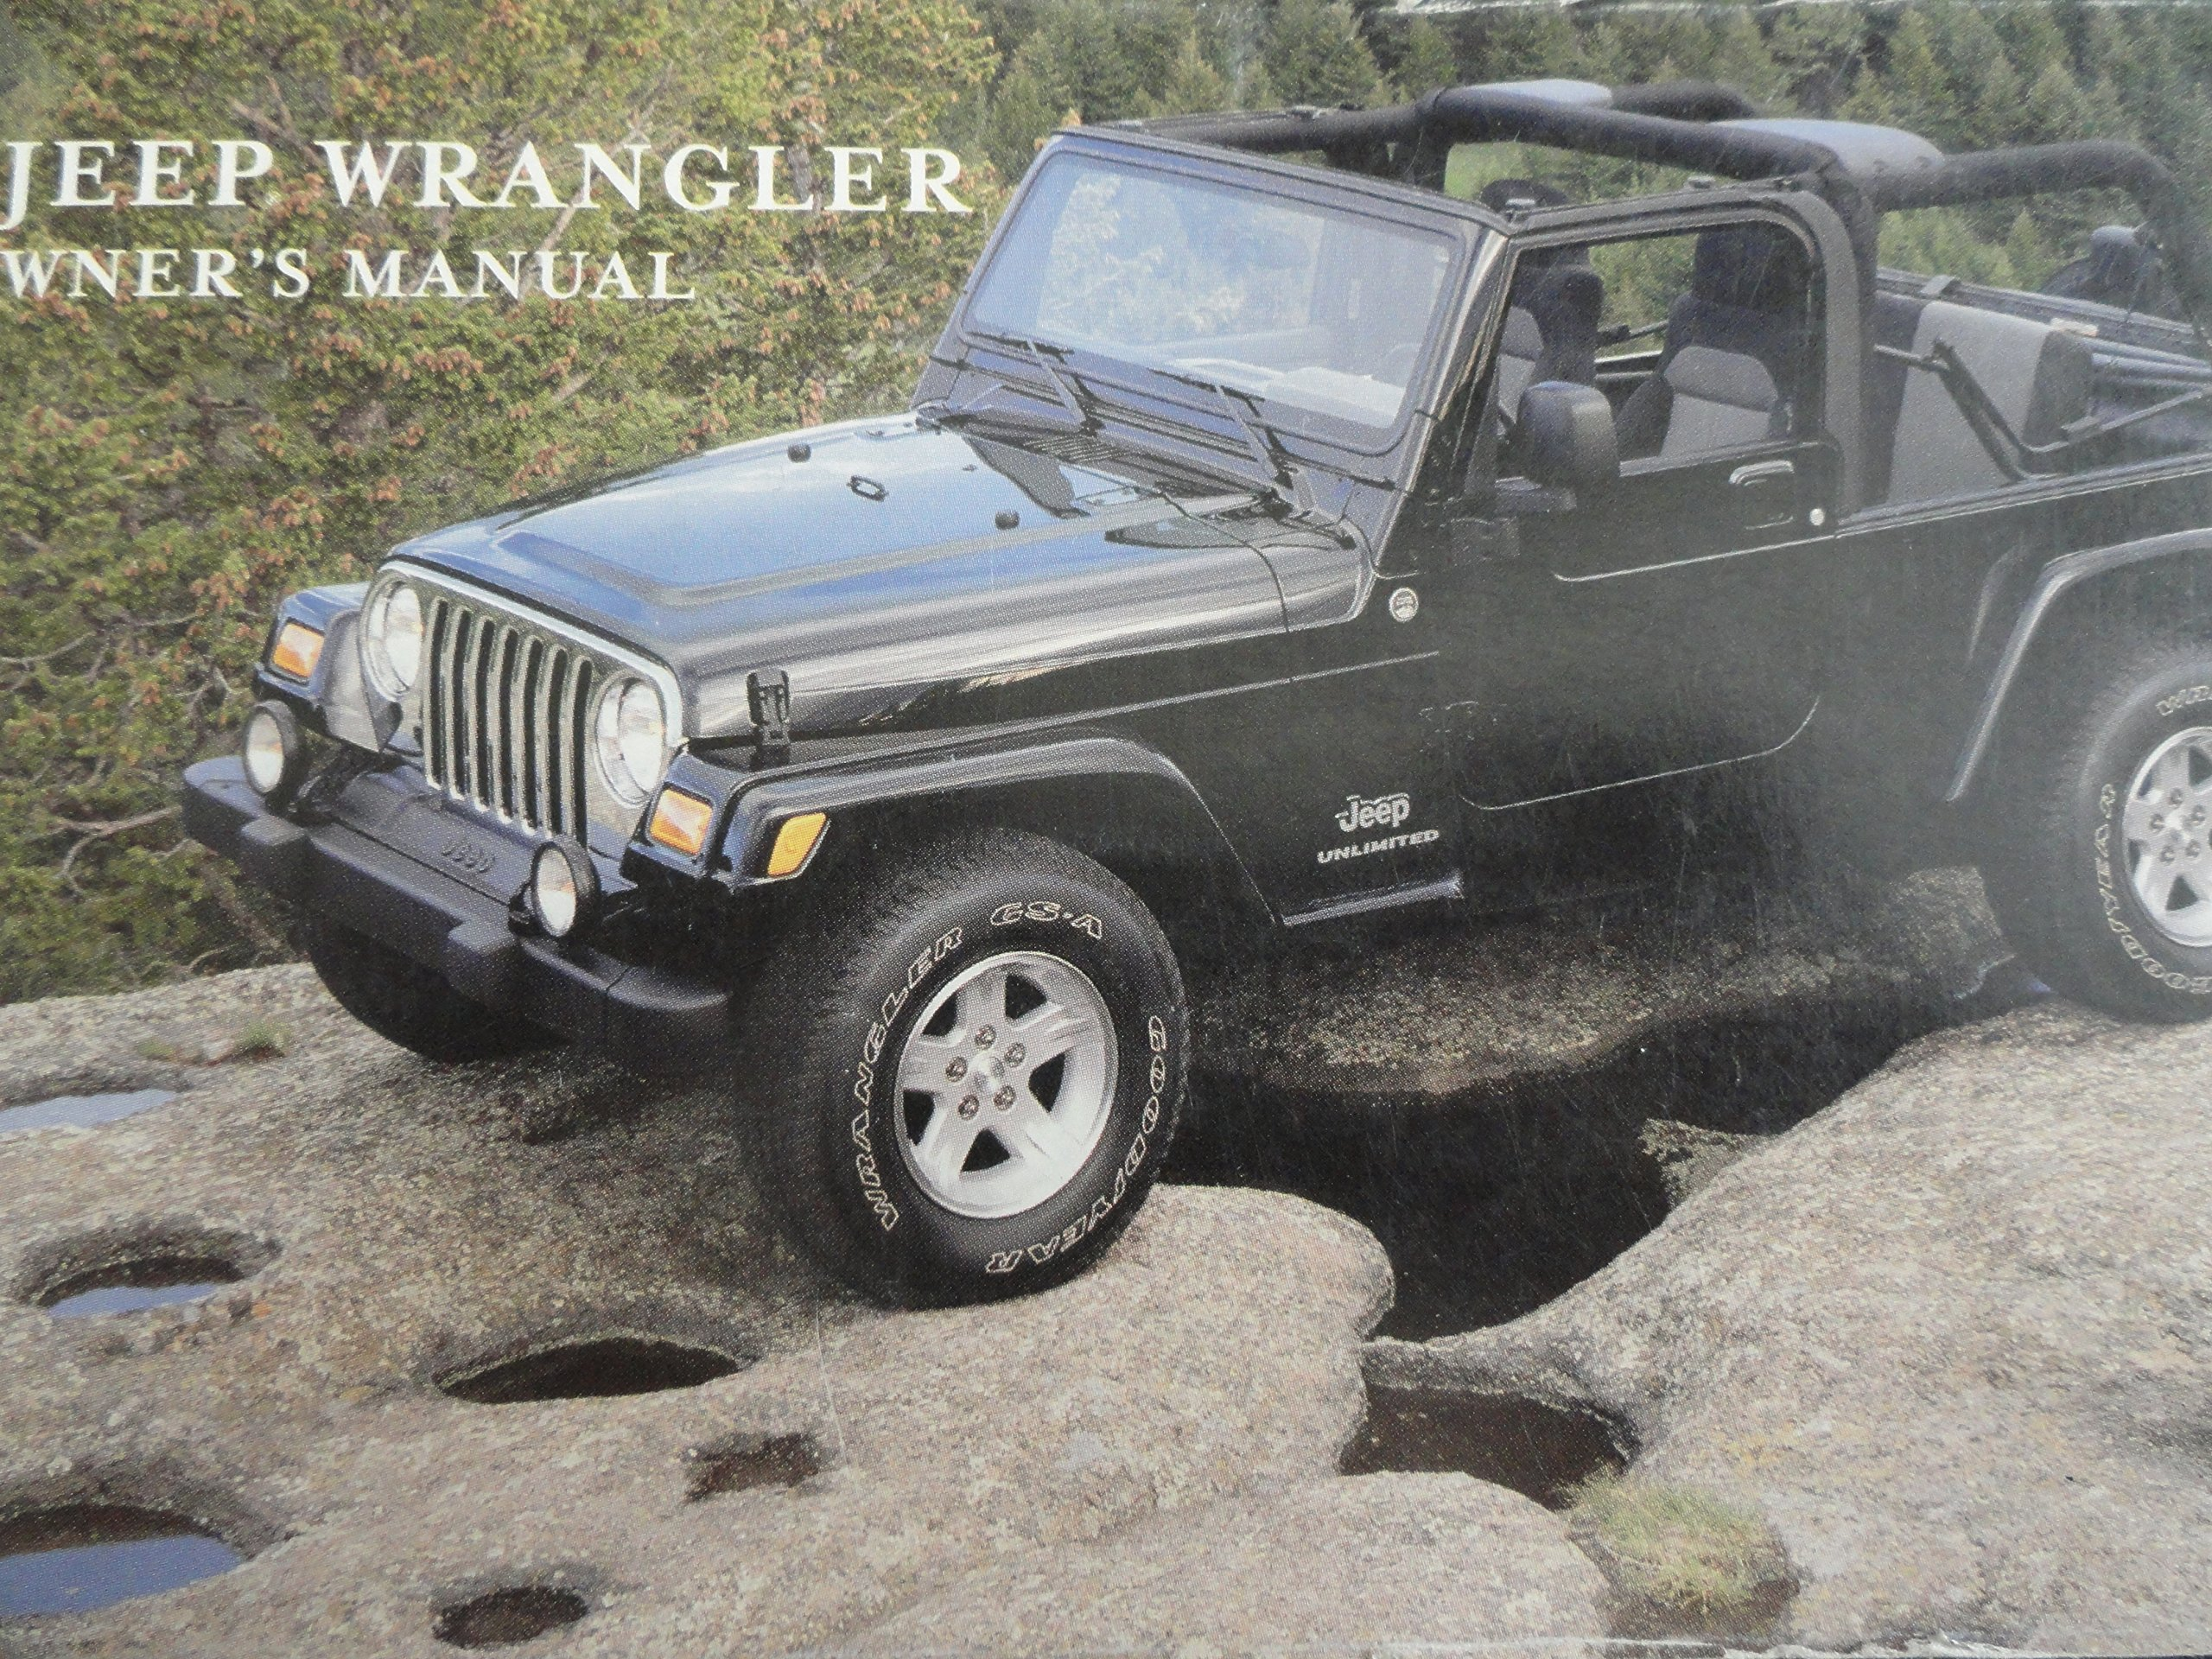 2005 jeep wrangler owners manual jeep amazon com books rh amazon com 2013 Jeep Wrangler Manual PDF 2004 jeep wrangler sport owners manual